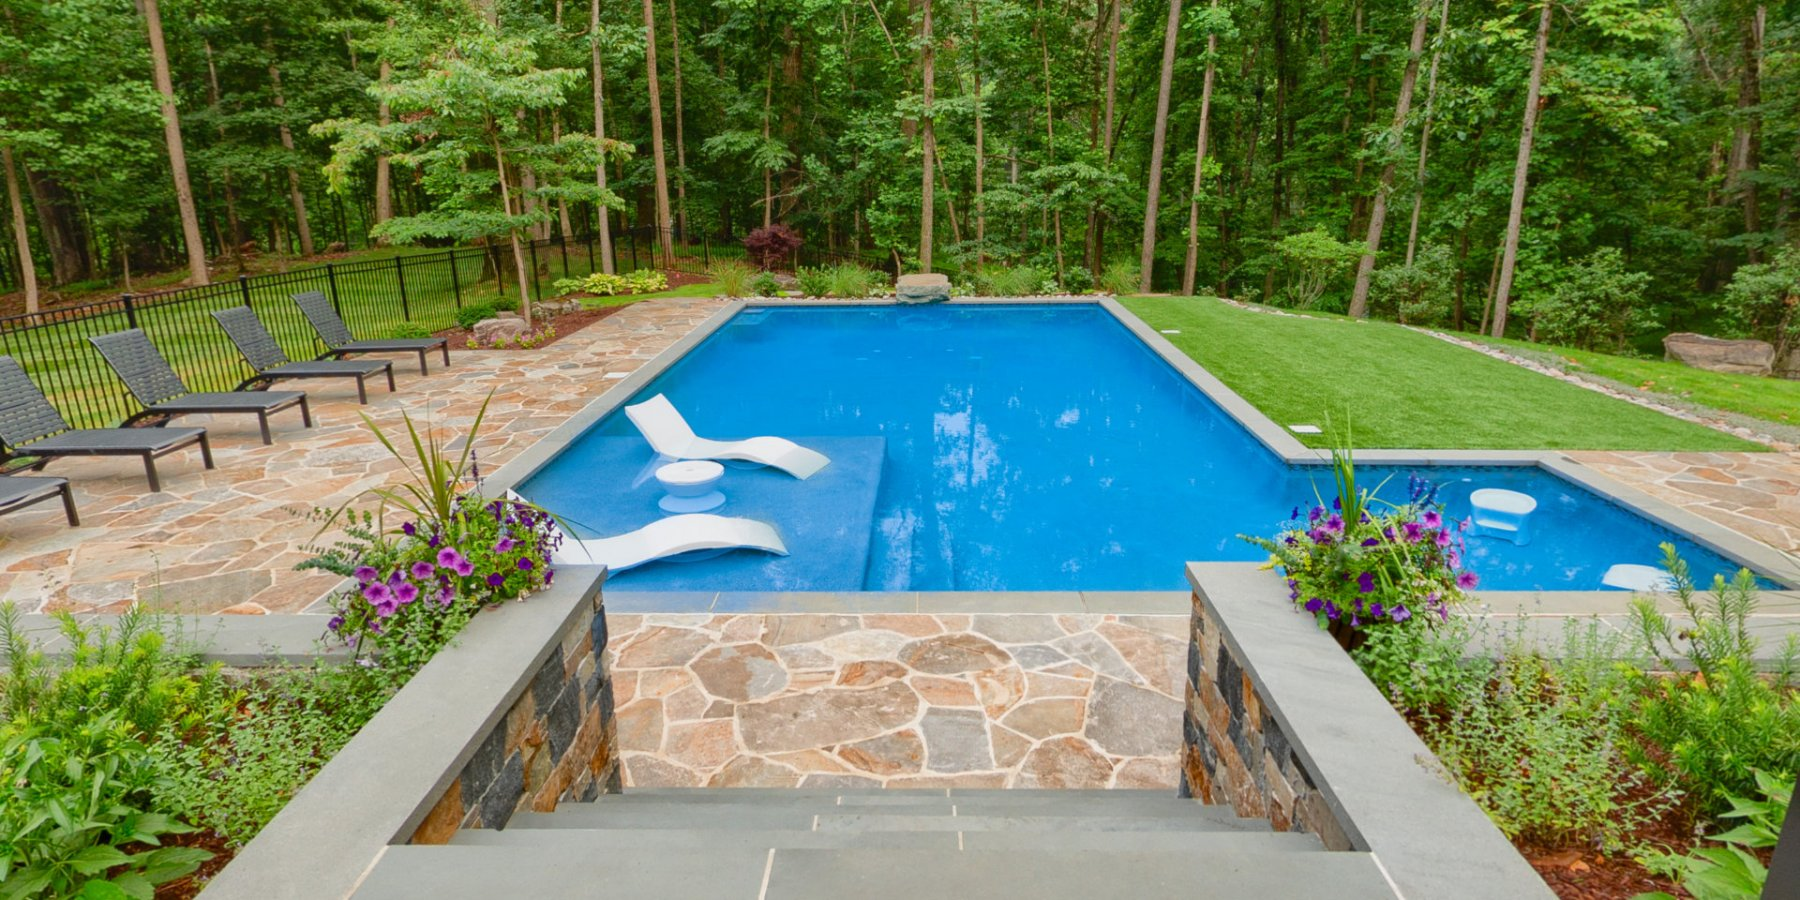 Pool-Gate-Day-690A0123a